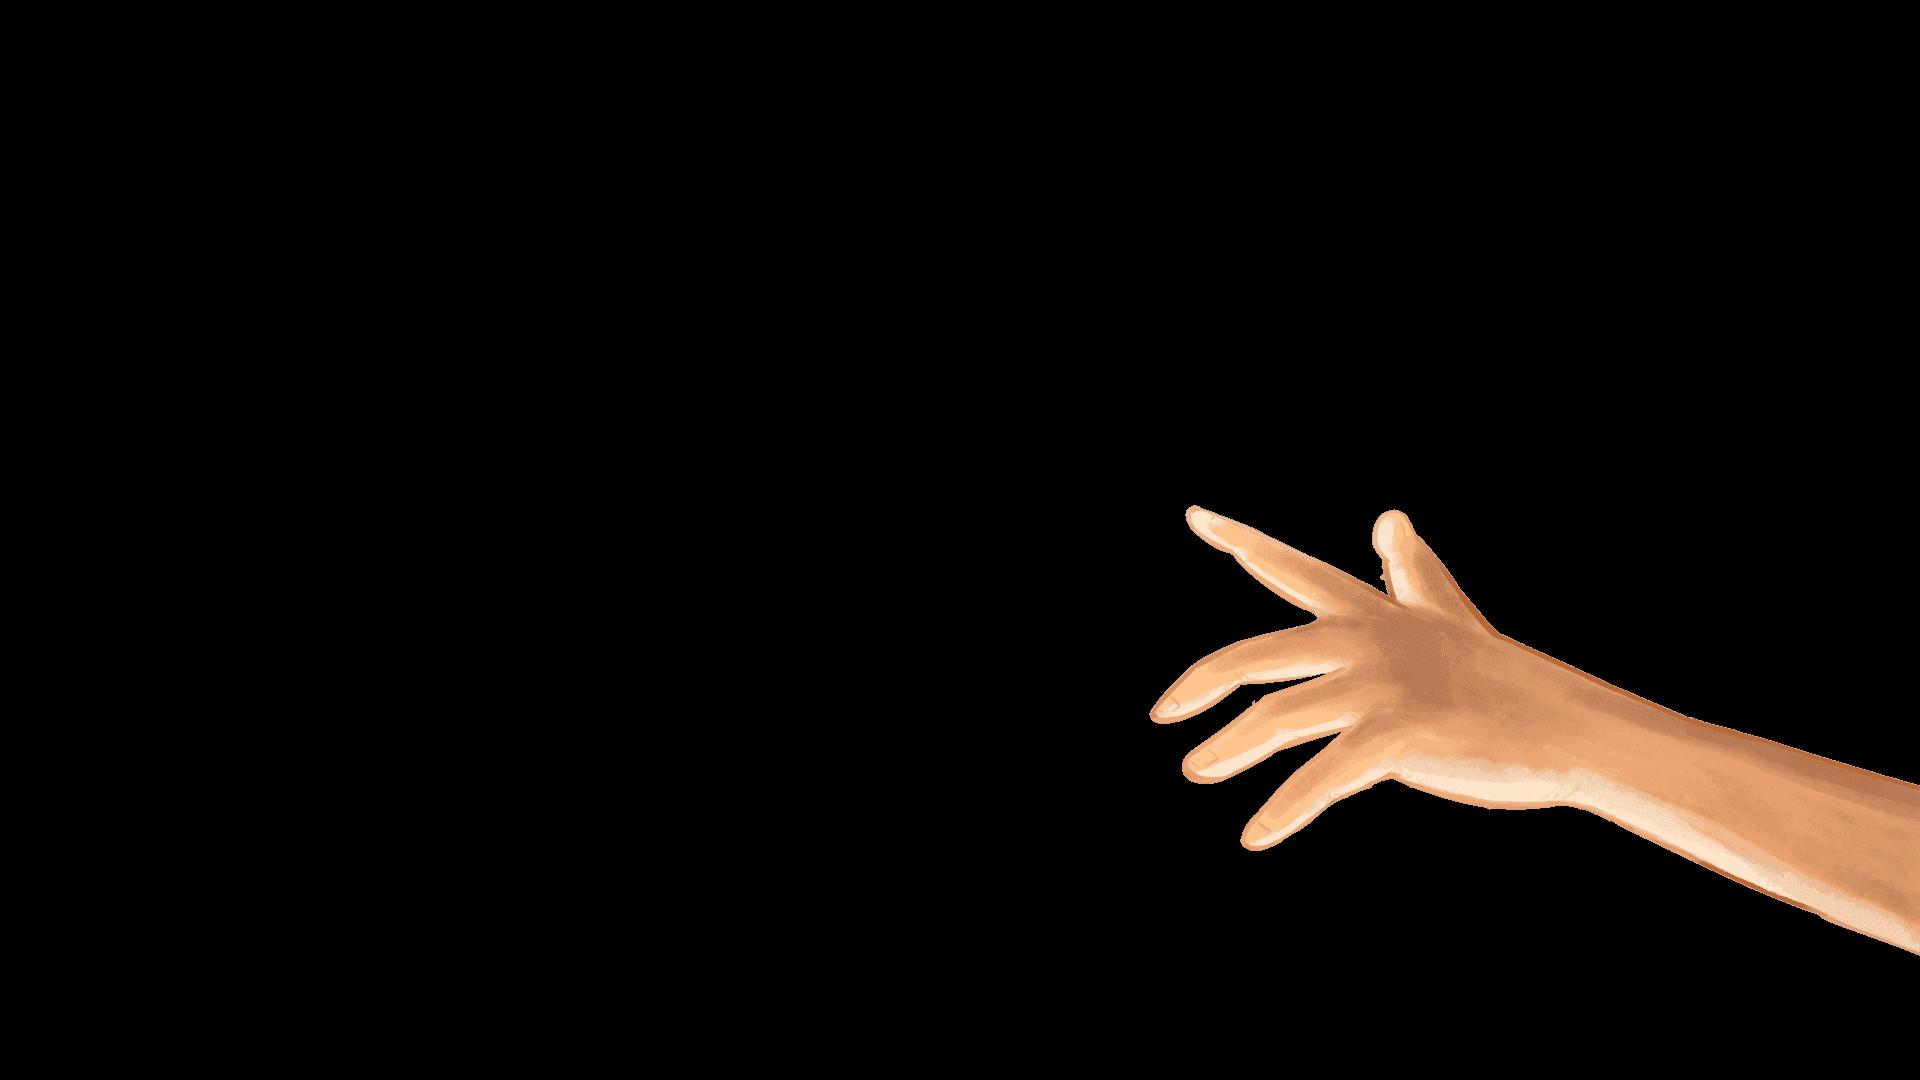 profirepro-kontakt-child-hand